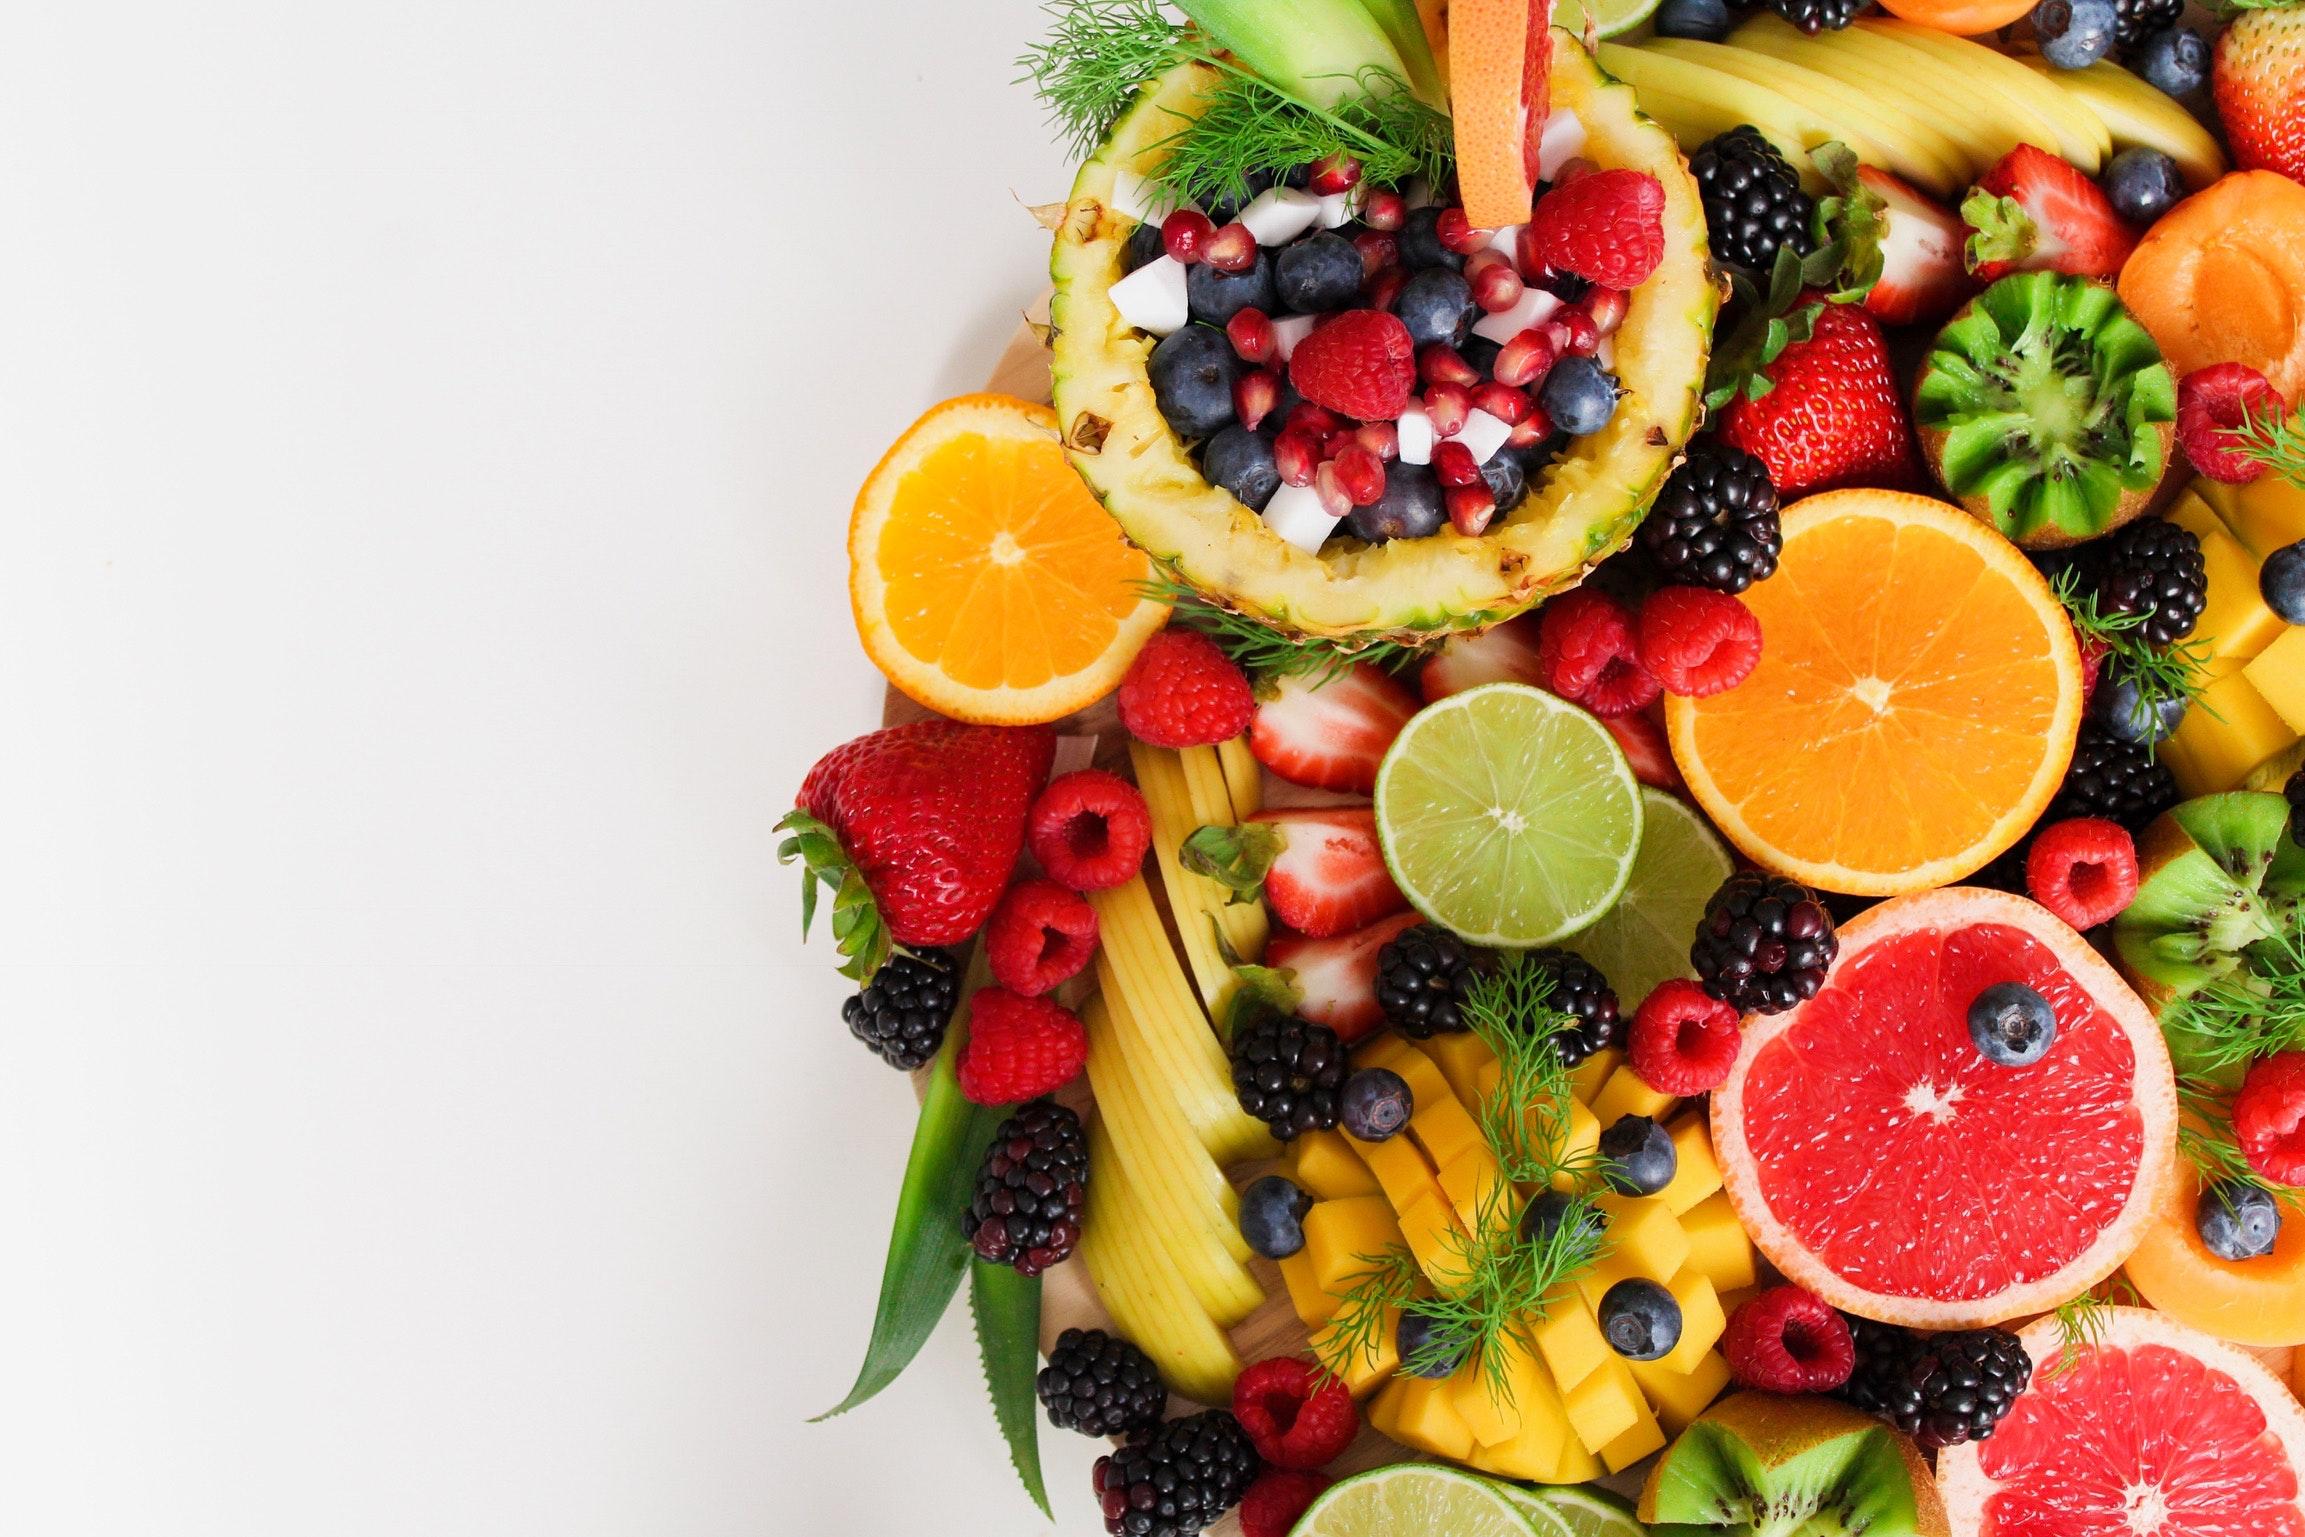 cata-apa-trebuie-sa-bem-din-fructe-si-legume